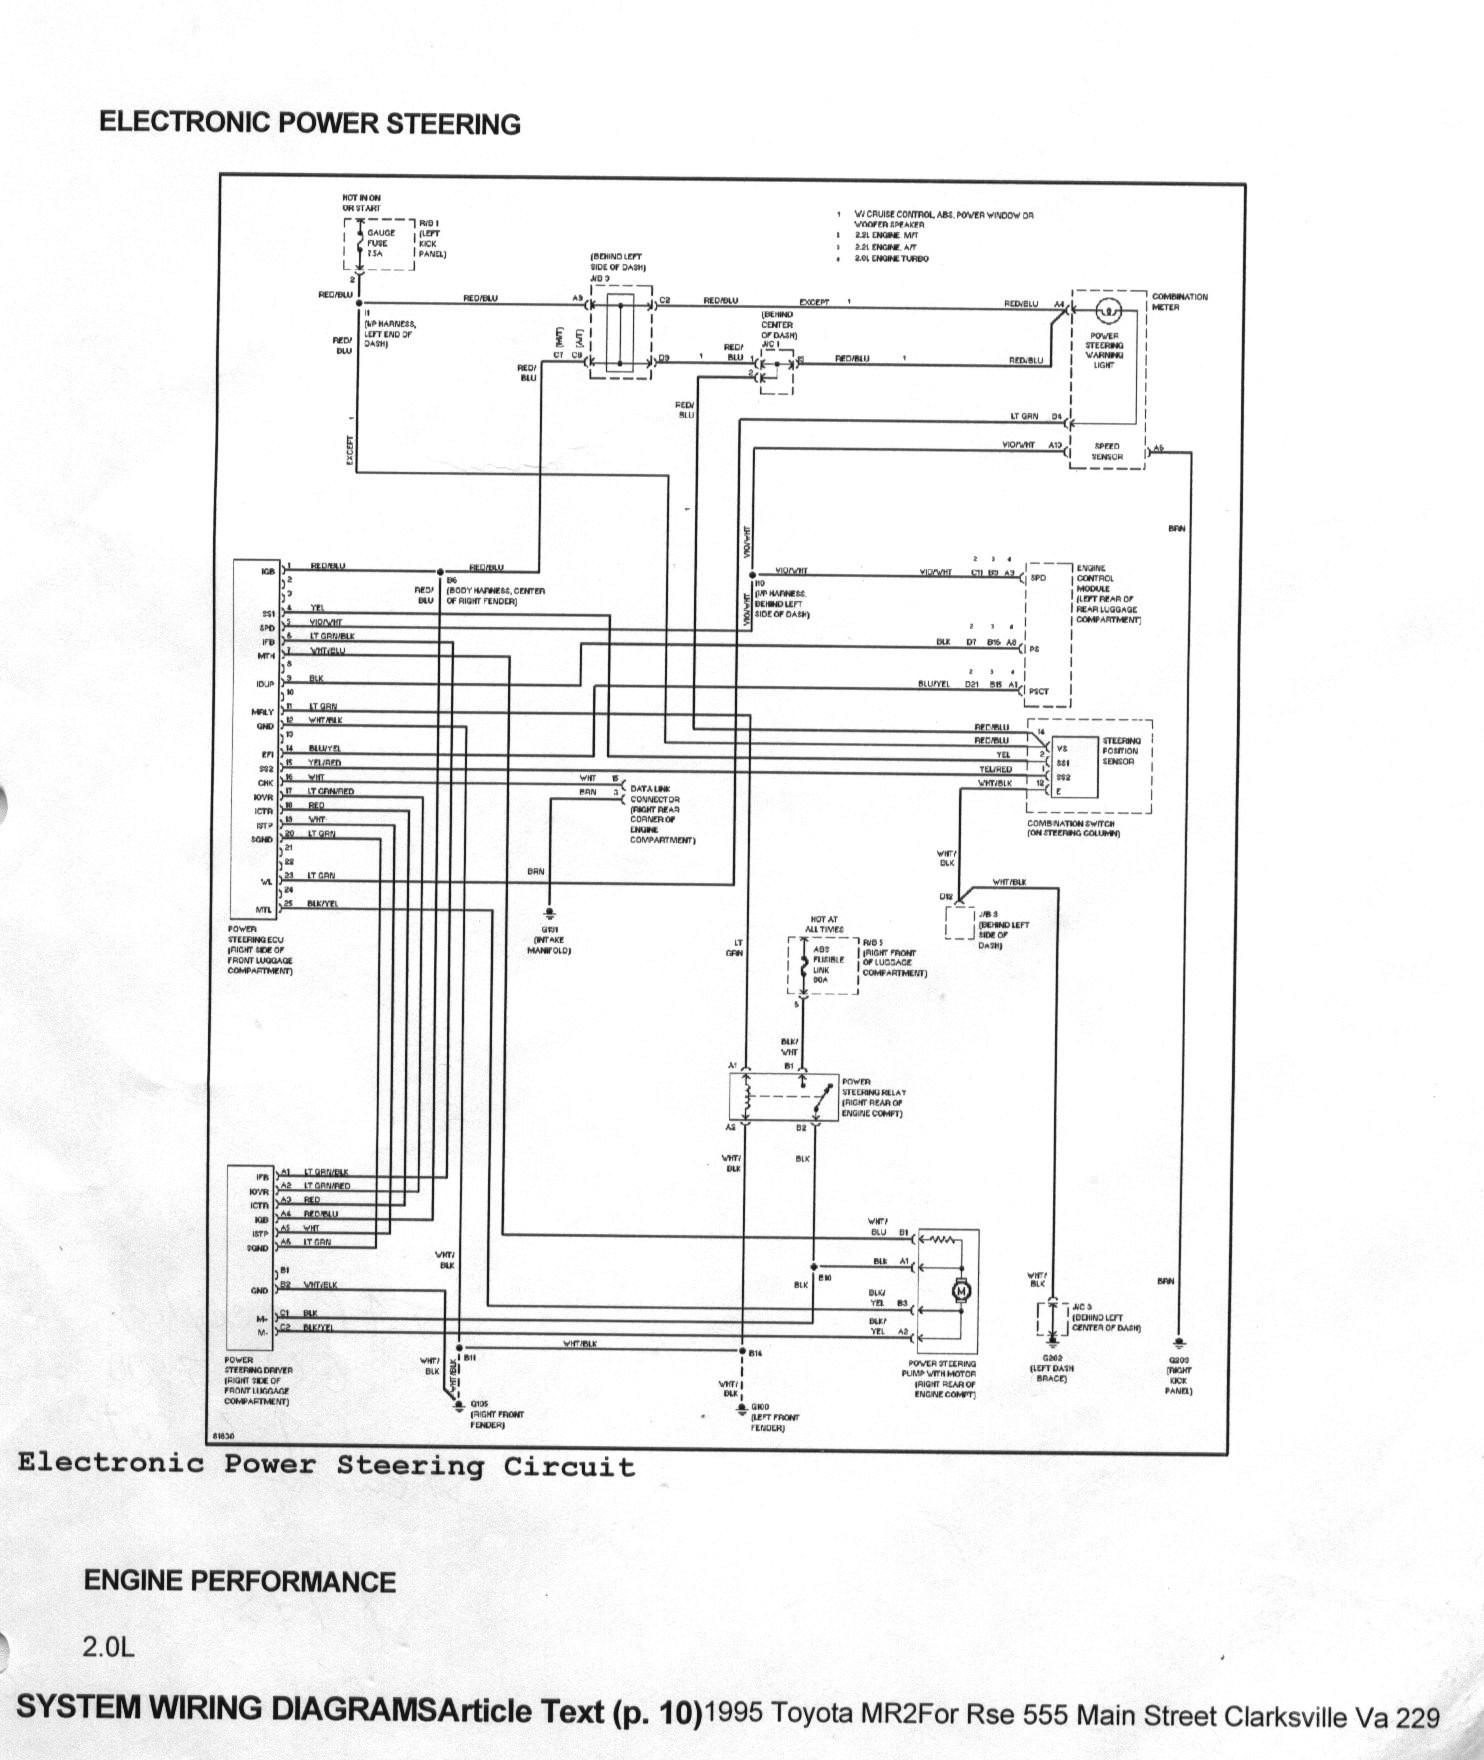 1987 Toyota Mr2 Antenna Wiring Schematic 2019 1988 System Diagrams Pdf File Diagram 1993 Supra Html Imageresizertool Com